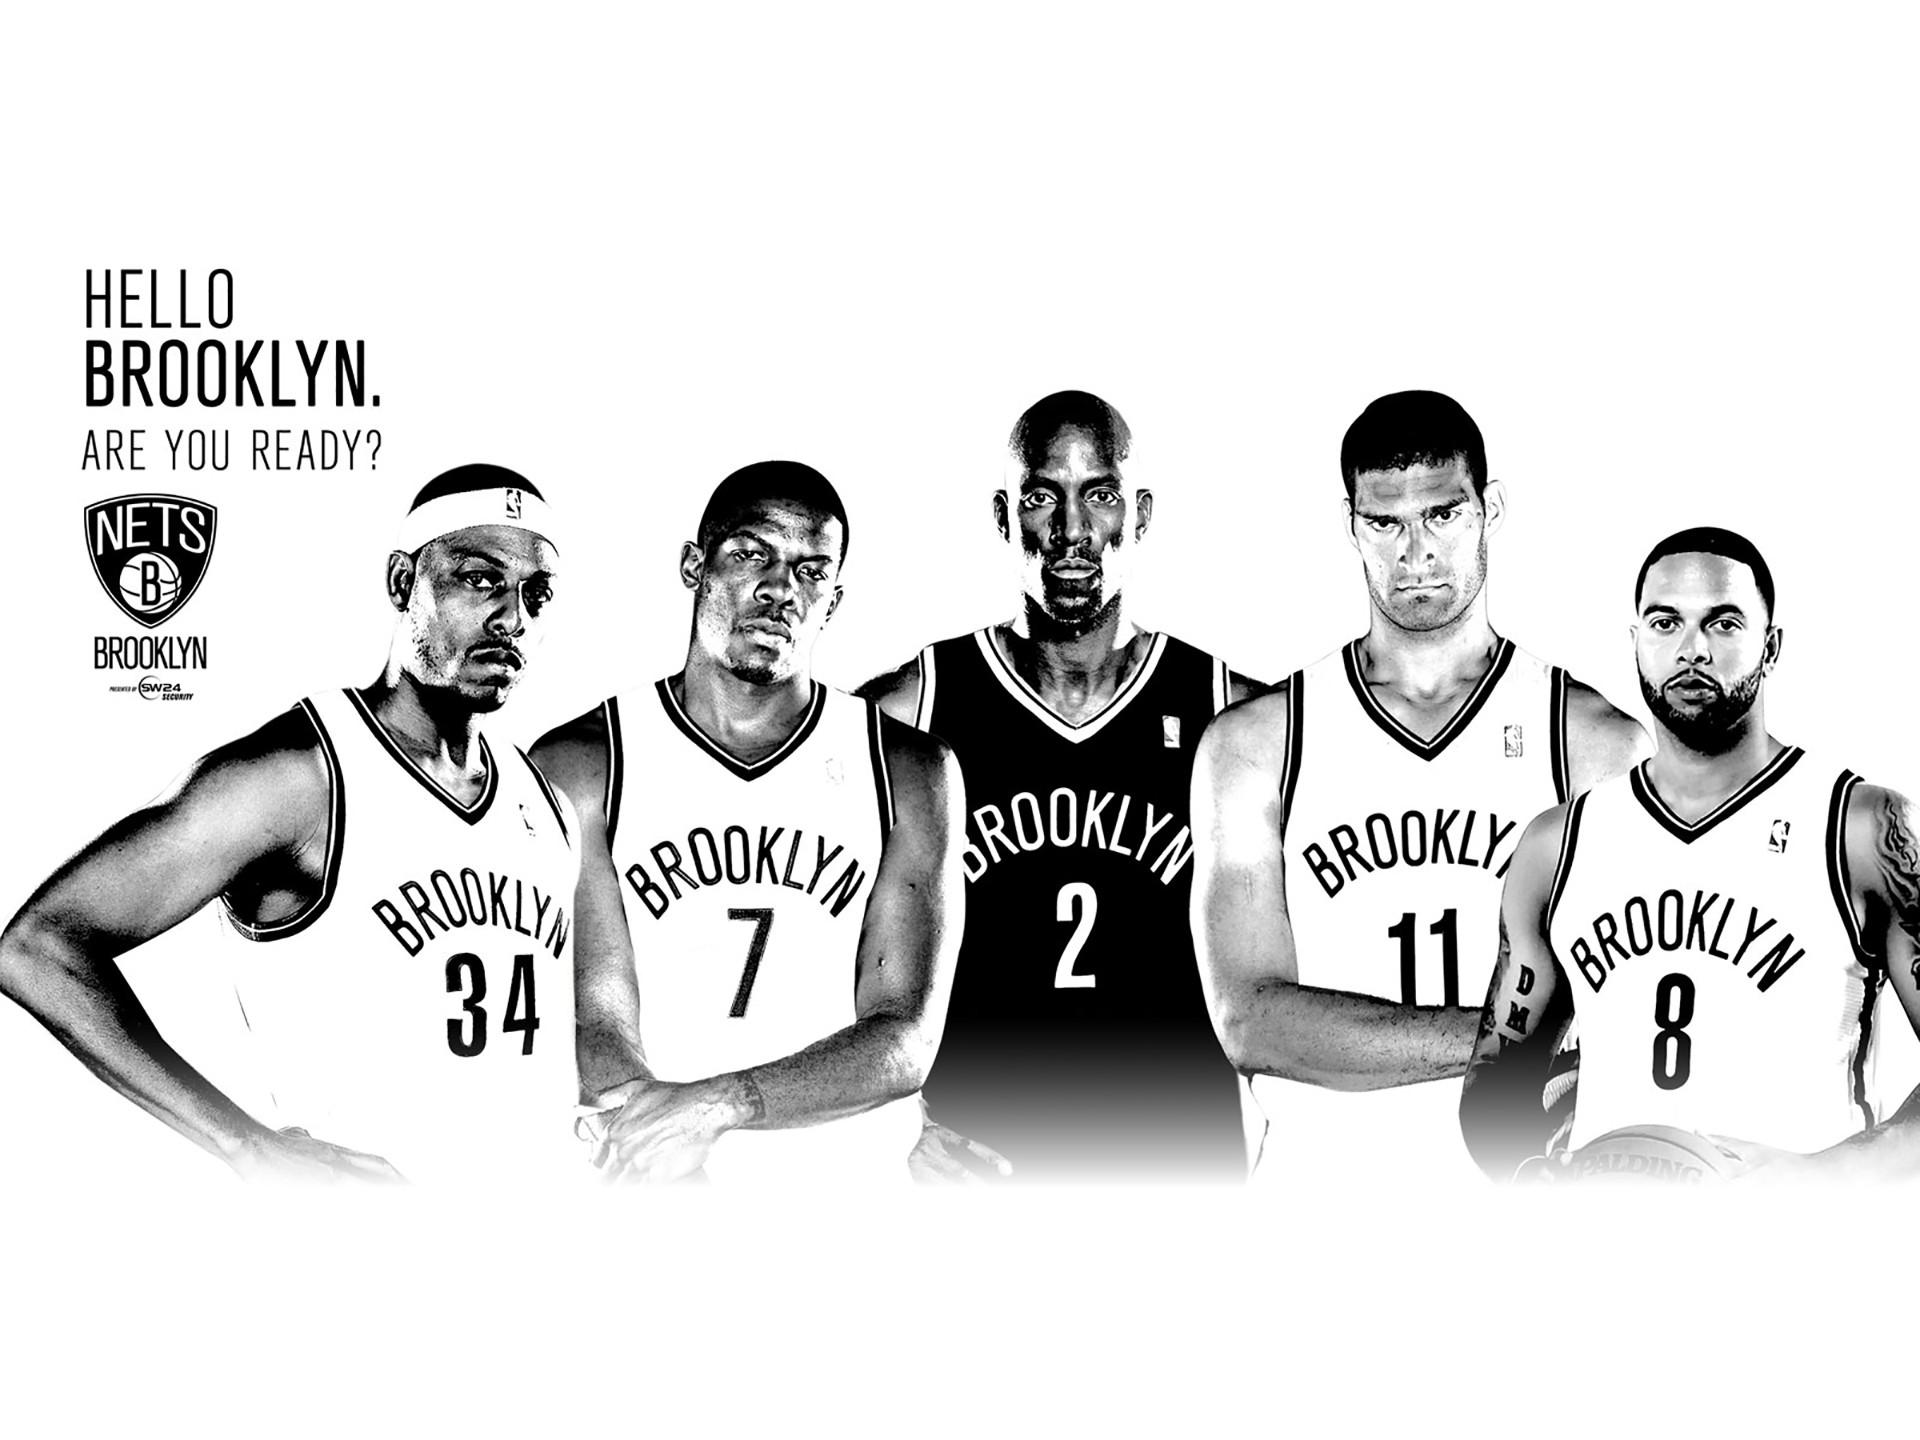 Brooklyn Nets Basketball Team   Brooklyn Nets 2014 NBA Team Wallpaper